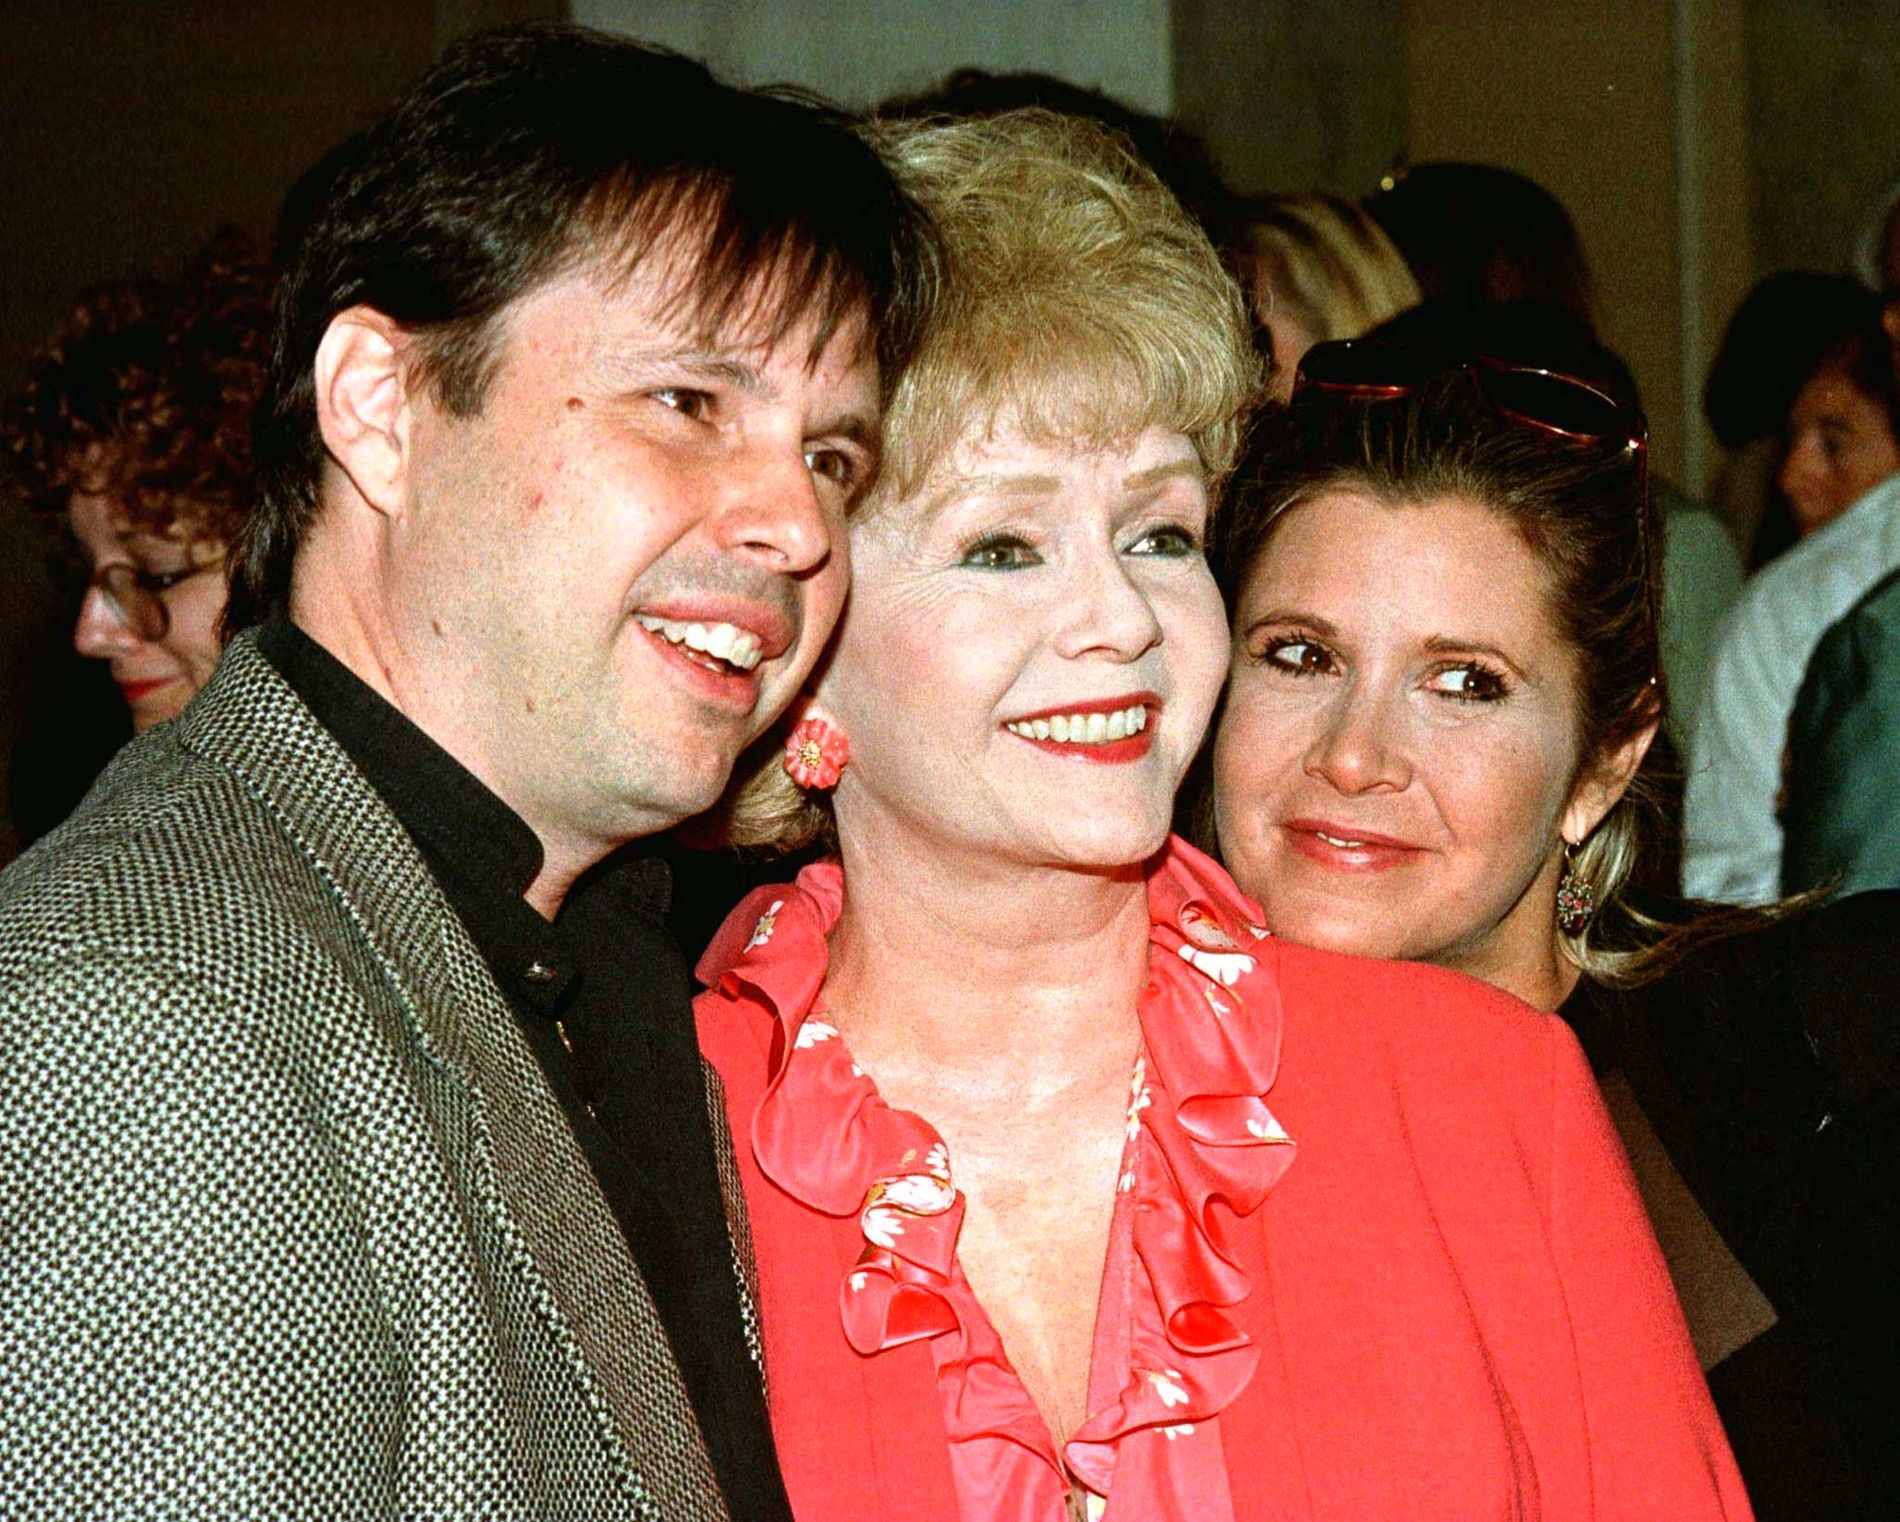 MISTET MOREN OG SØSTEREN: Filmskaper Todd Fisher sammen med moren Debbie Reynolds og søsteren Carrie Fisher i 1998.